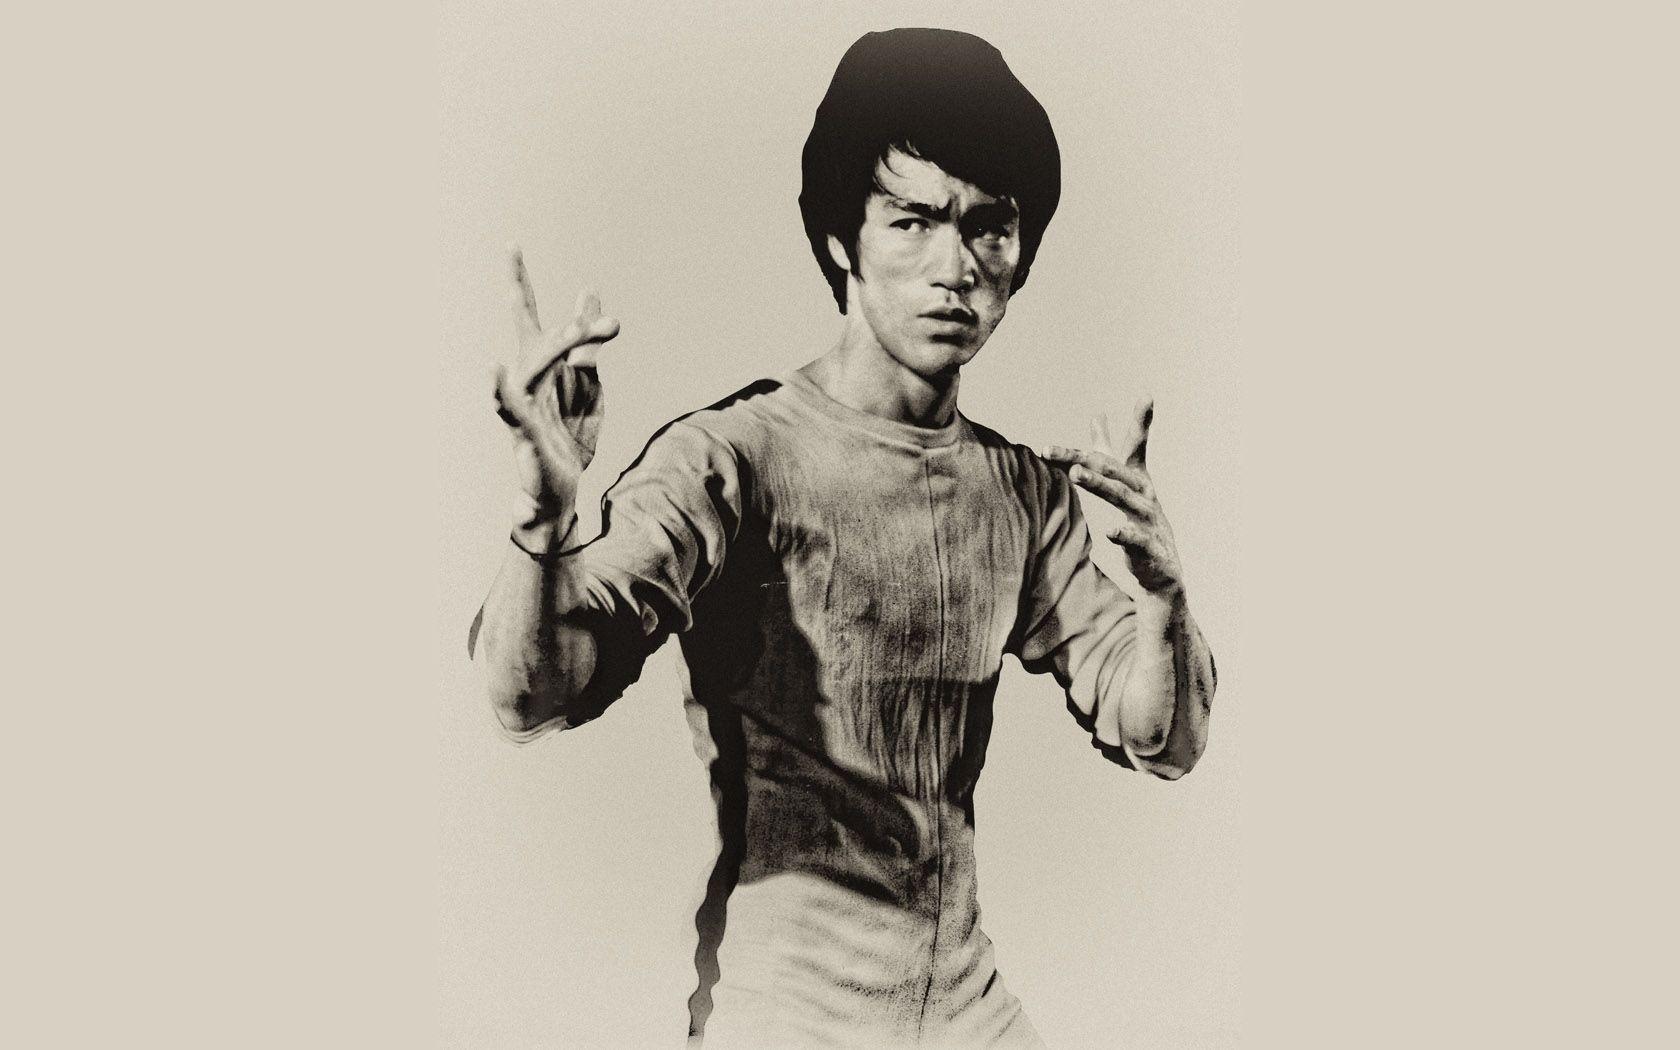 Bruce Lee Wallpaper Desktop Hd 26452 | STOREJPG